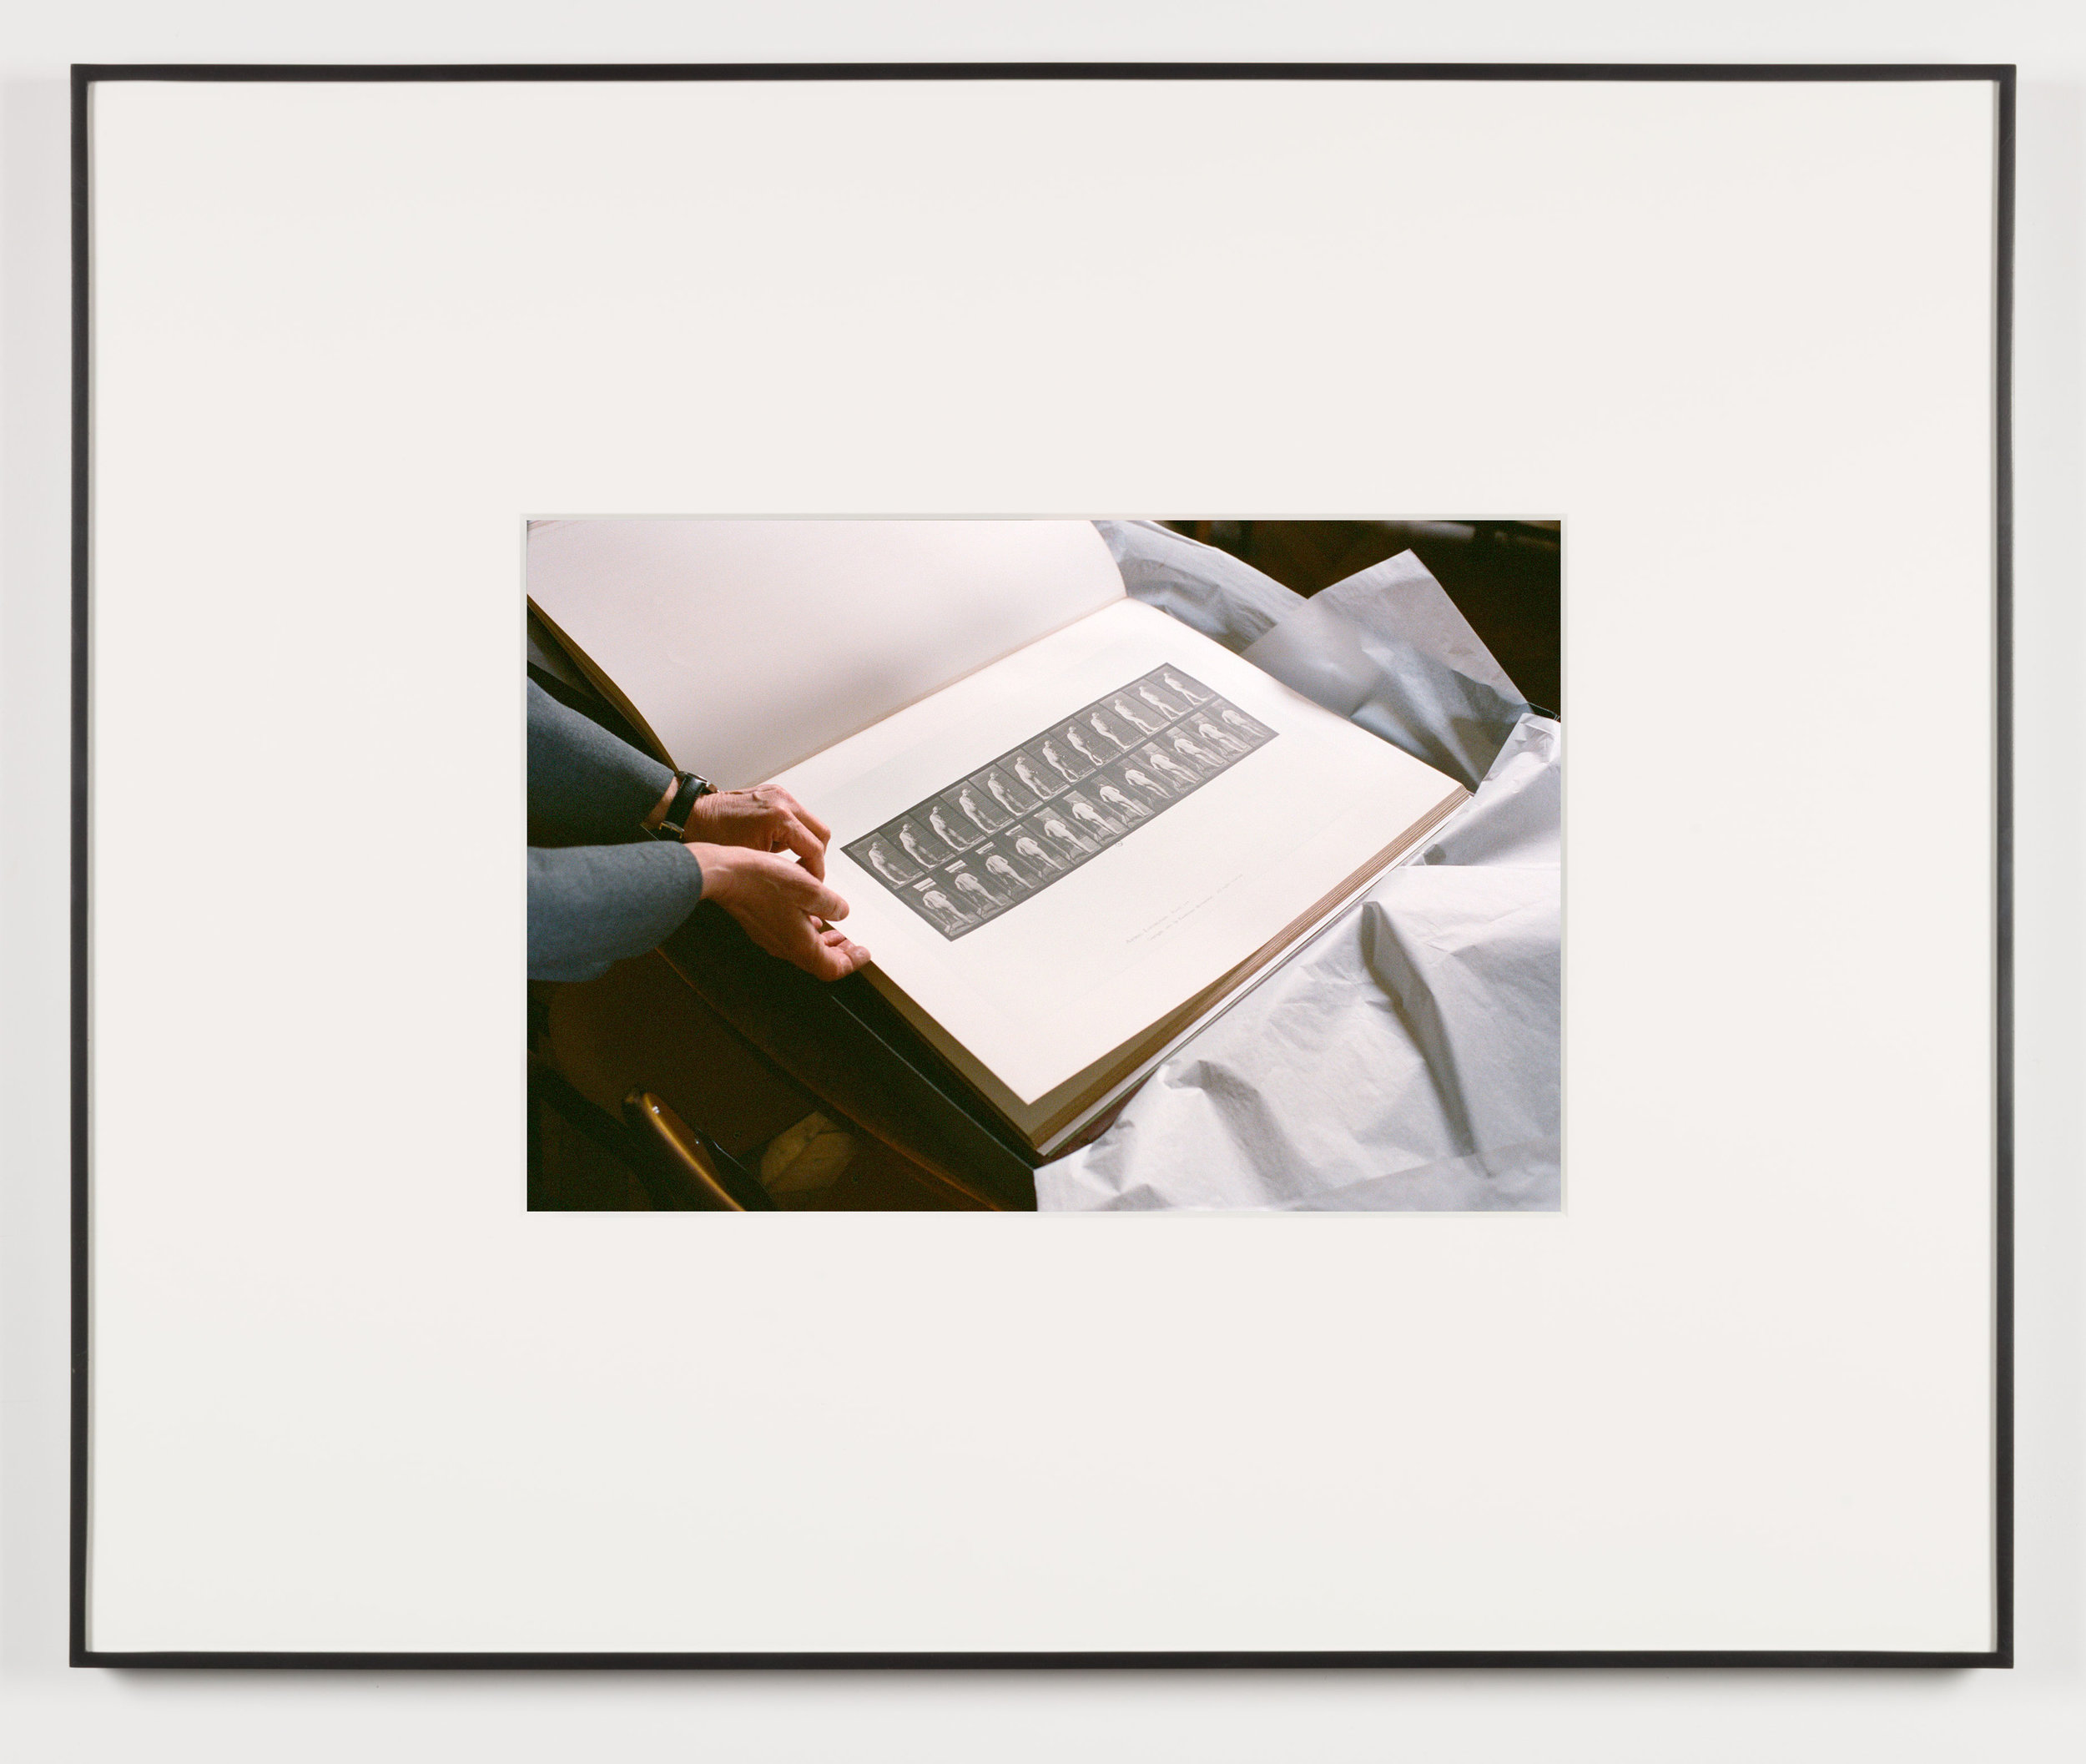 Der Herrscher (Paris, France, March 12, 2013)   2014  Chromogenic print  13 1/2 x 20 inches   Art Handling, 2011–    Selected Bodies of Work, 2014